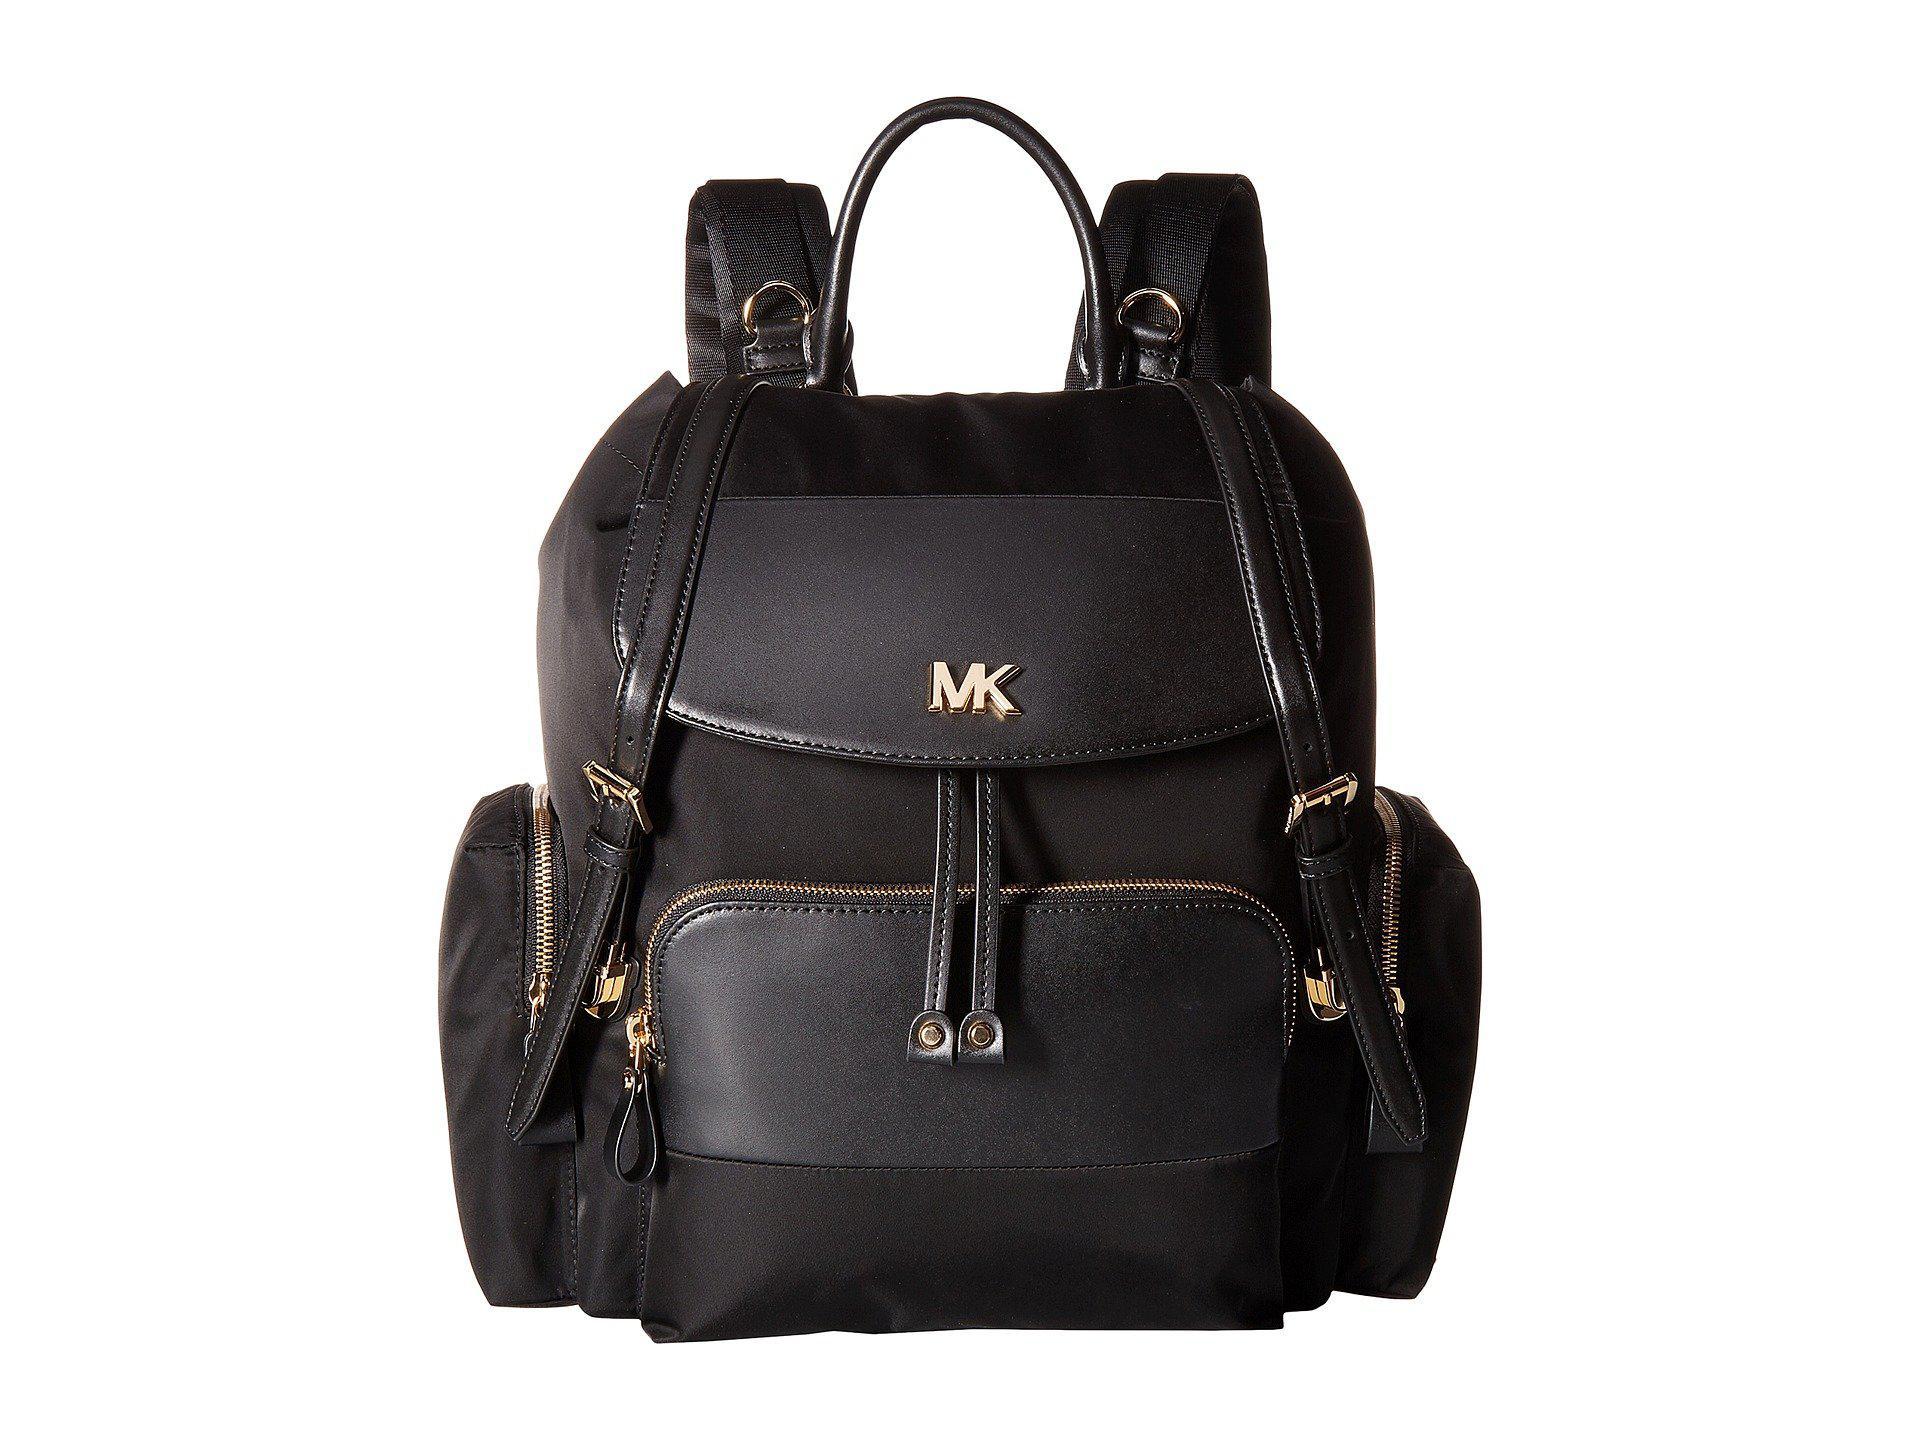 9d9305f79042 Lyst - MICHAEL Michael Kors Mott Large Flap Diaper Bag Backpack ...